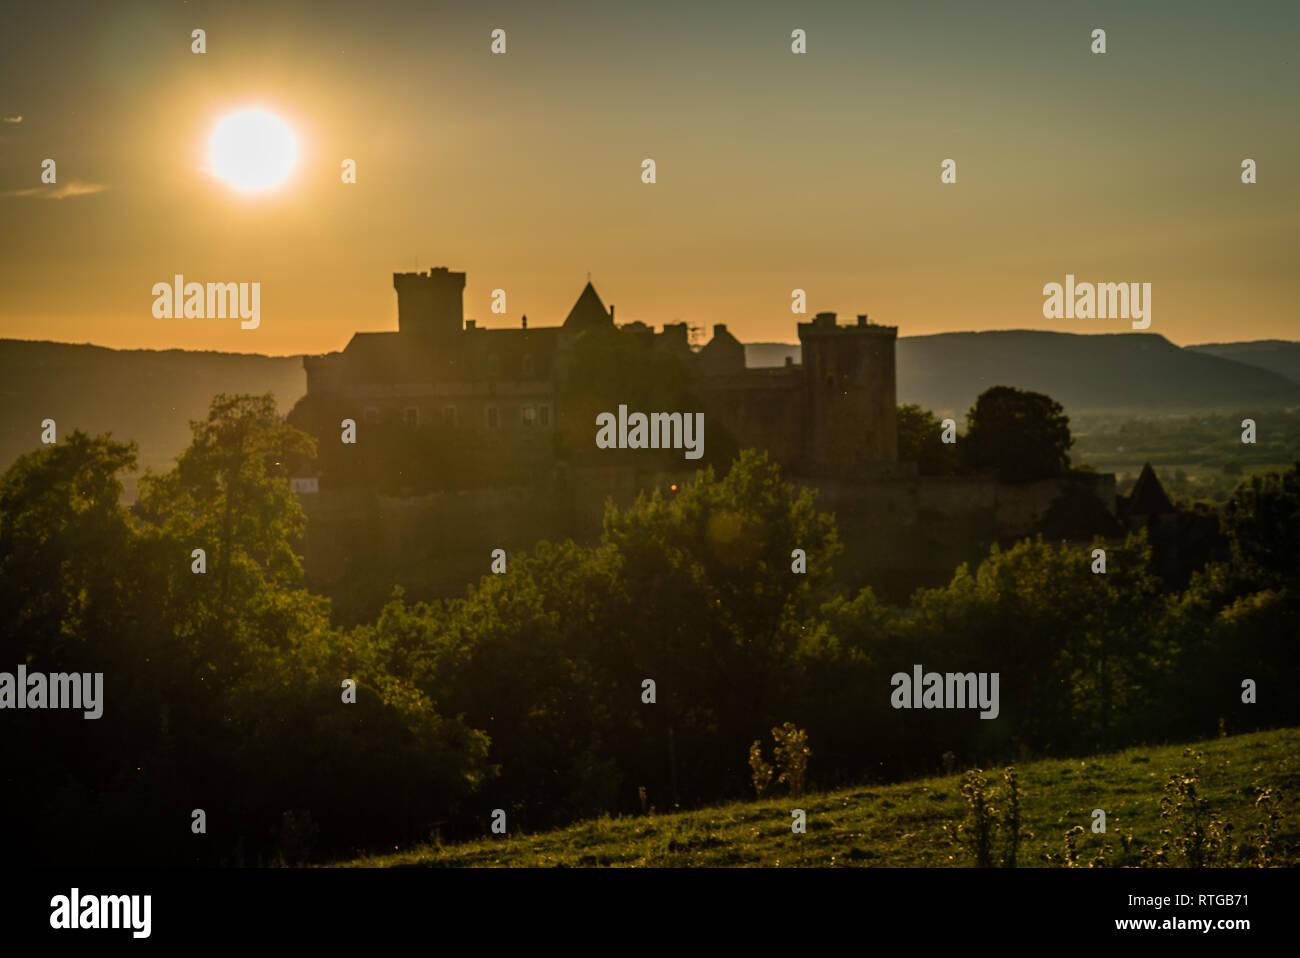 Castelnau castle in Prudhomat close to Bretenoux in France Stock Photo